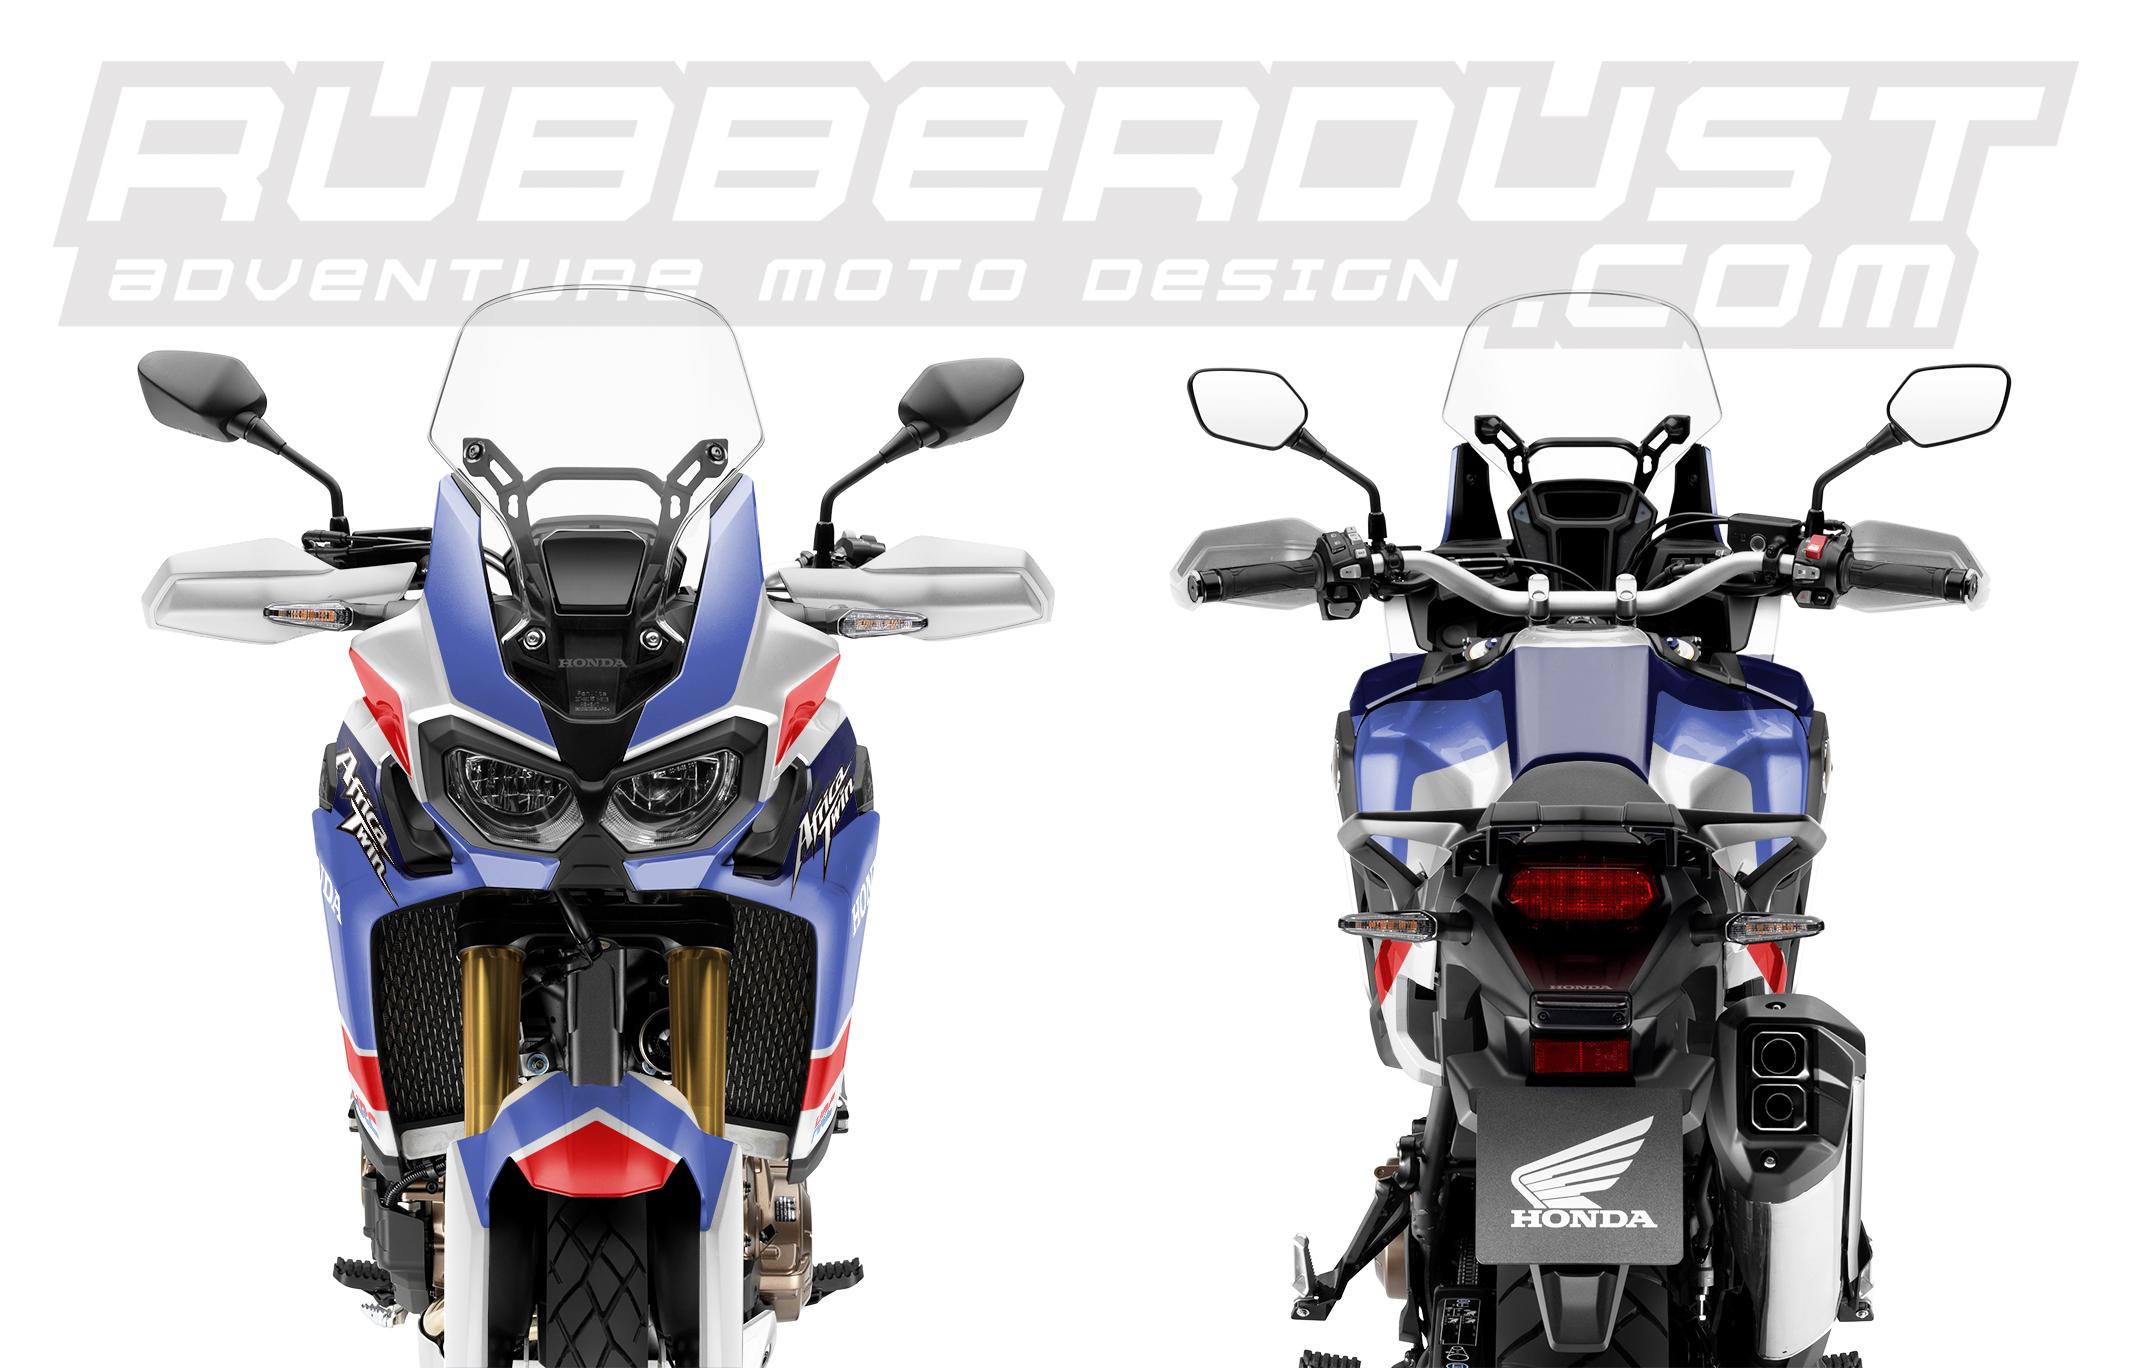 Xt Yamaha Parts